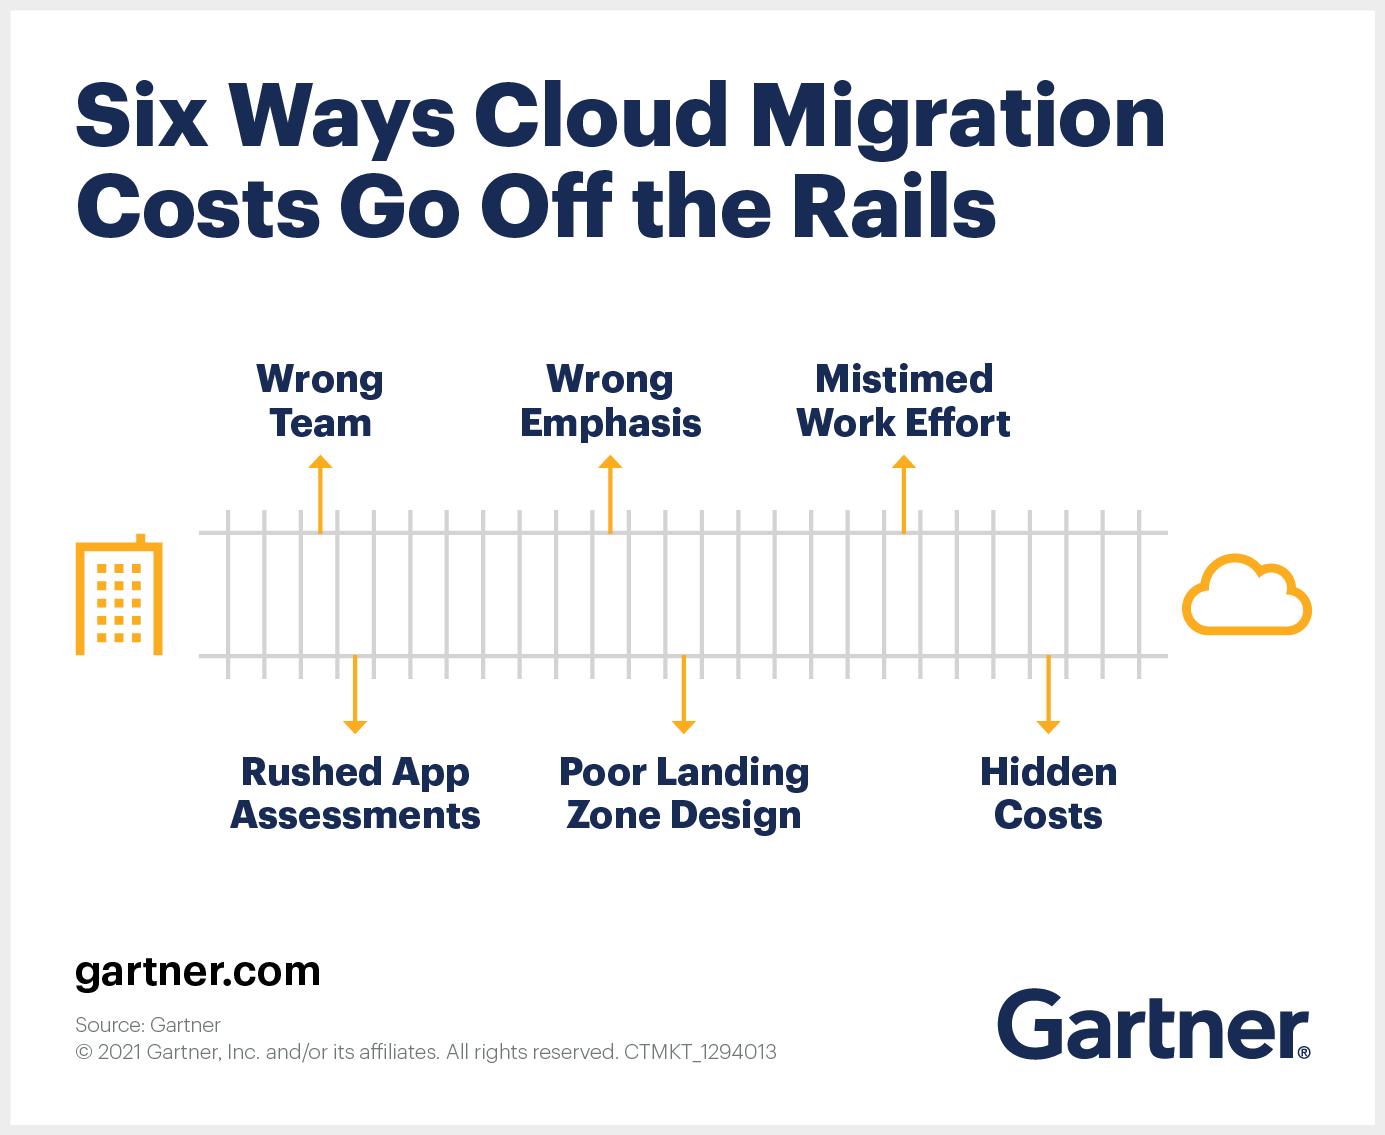 6 Ways Cloud Migration Costs Go off the Rails